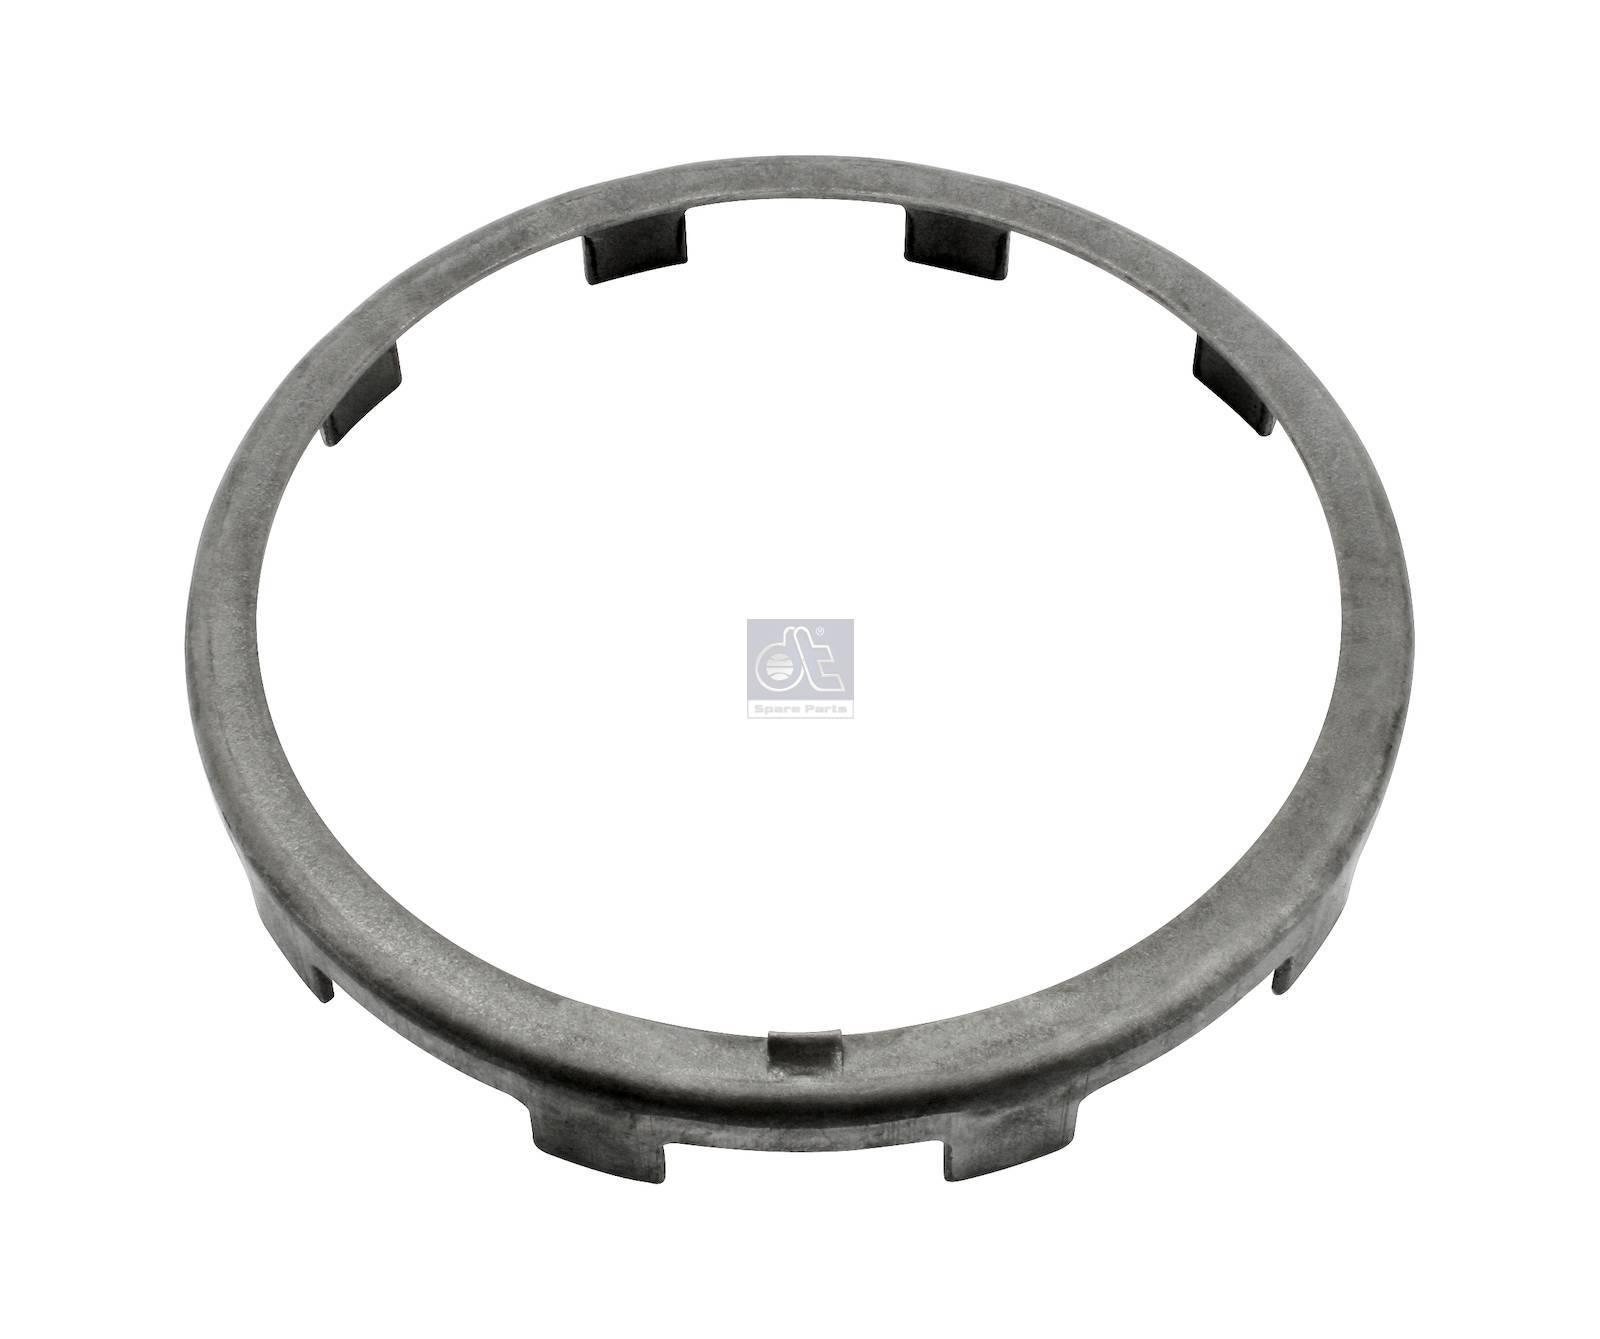 Sensor ring